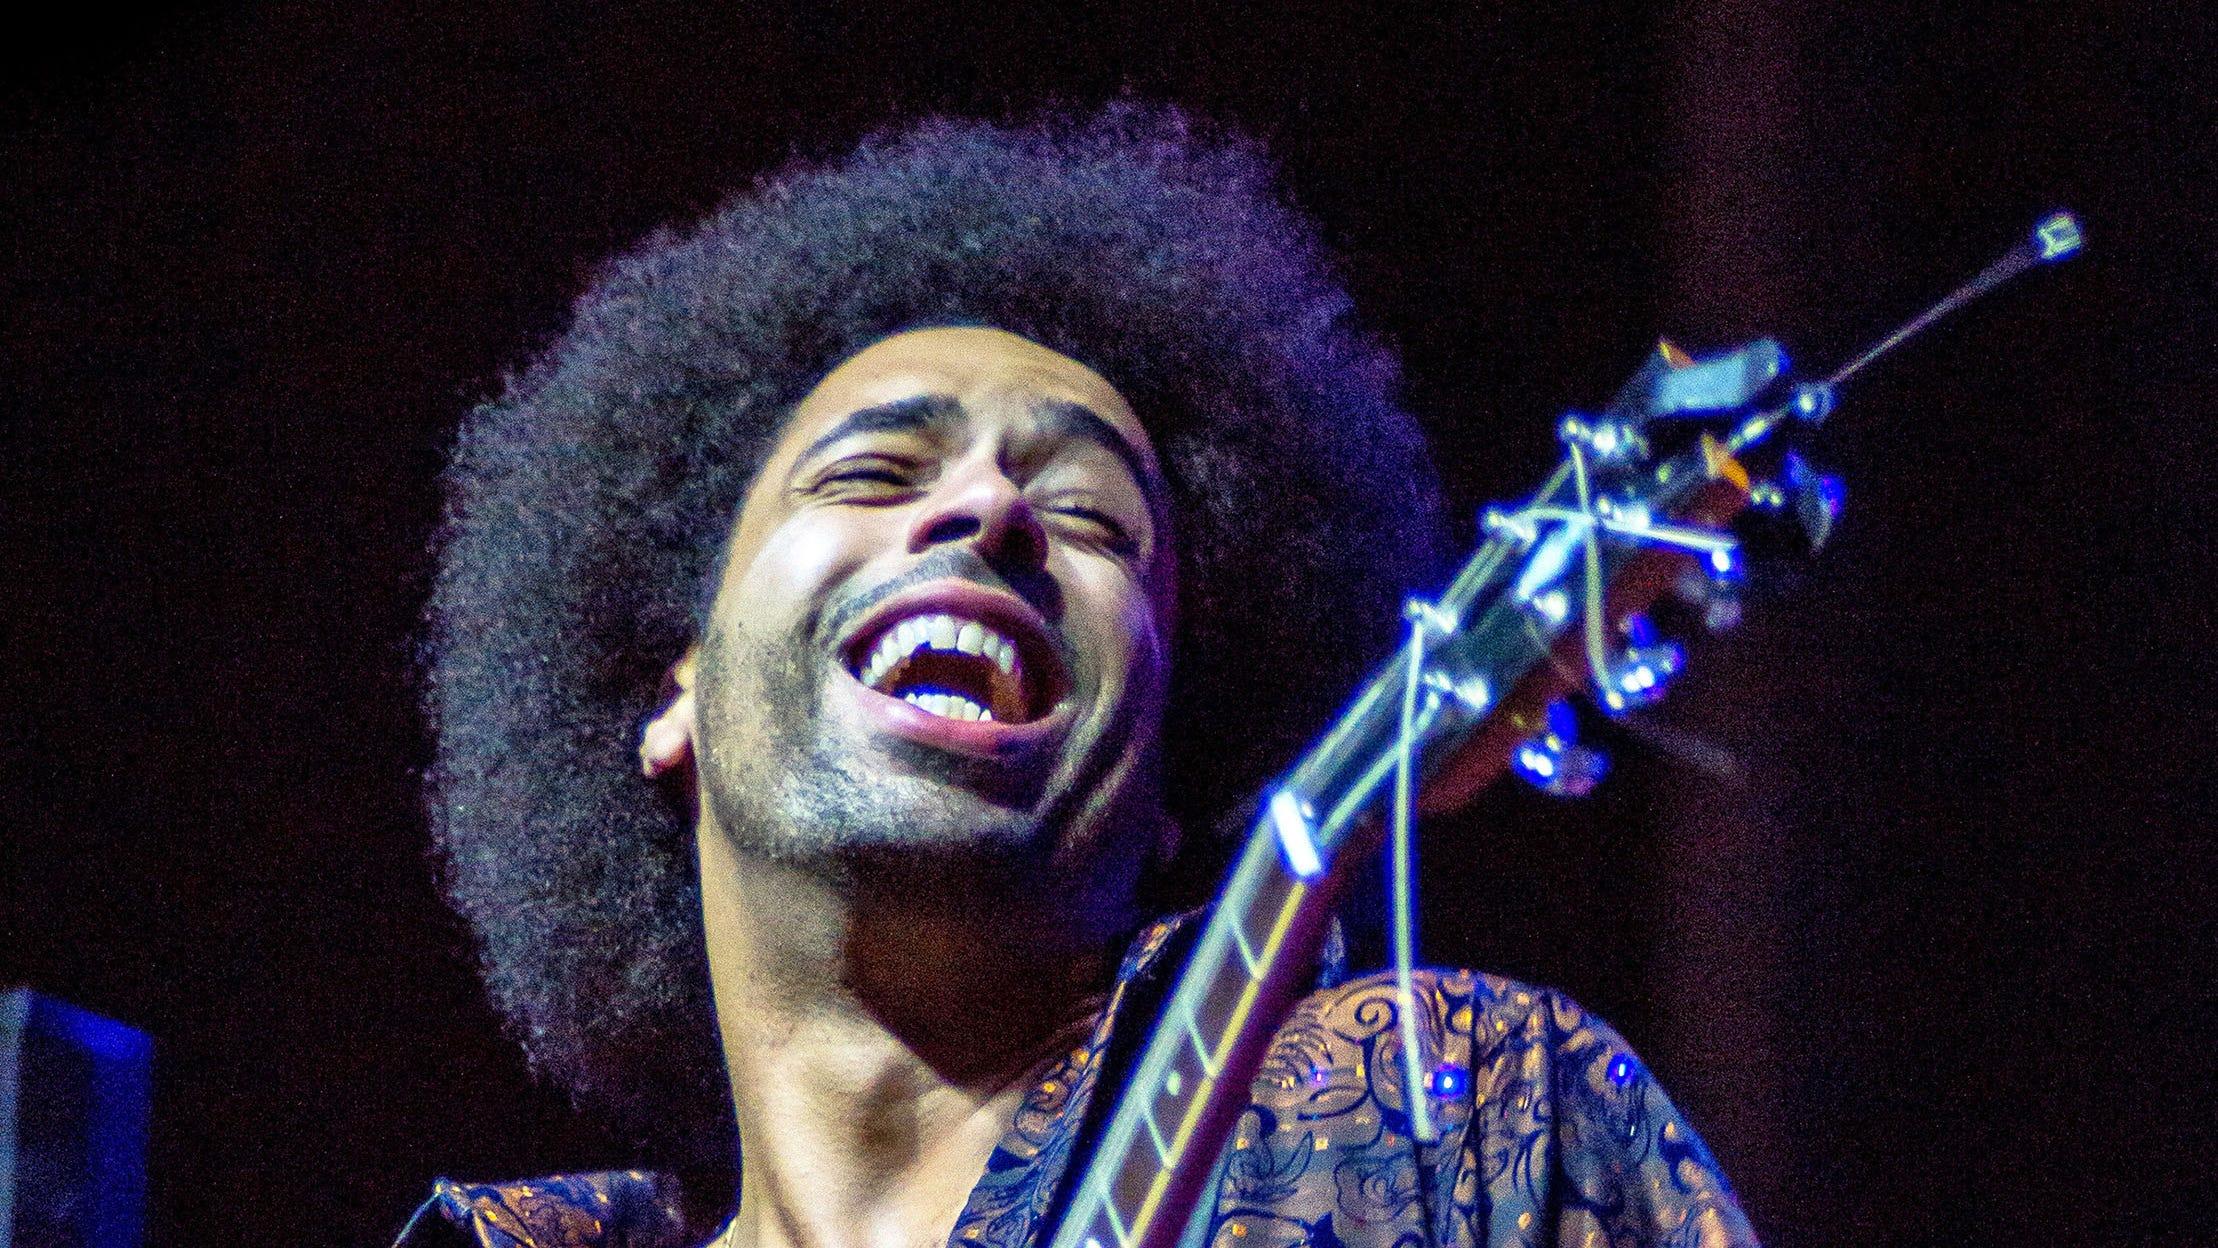 Bonita looks good in blues: Triple shows open performance season